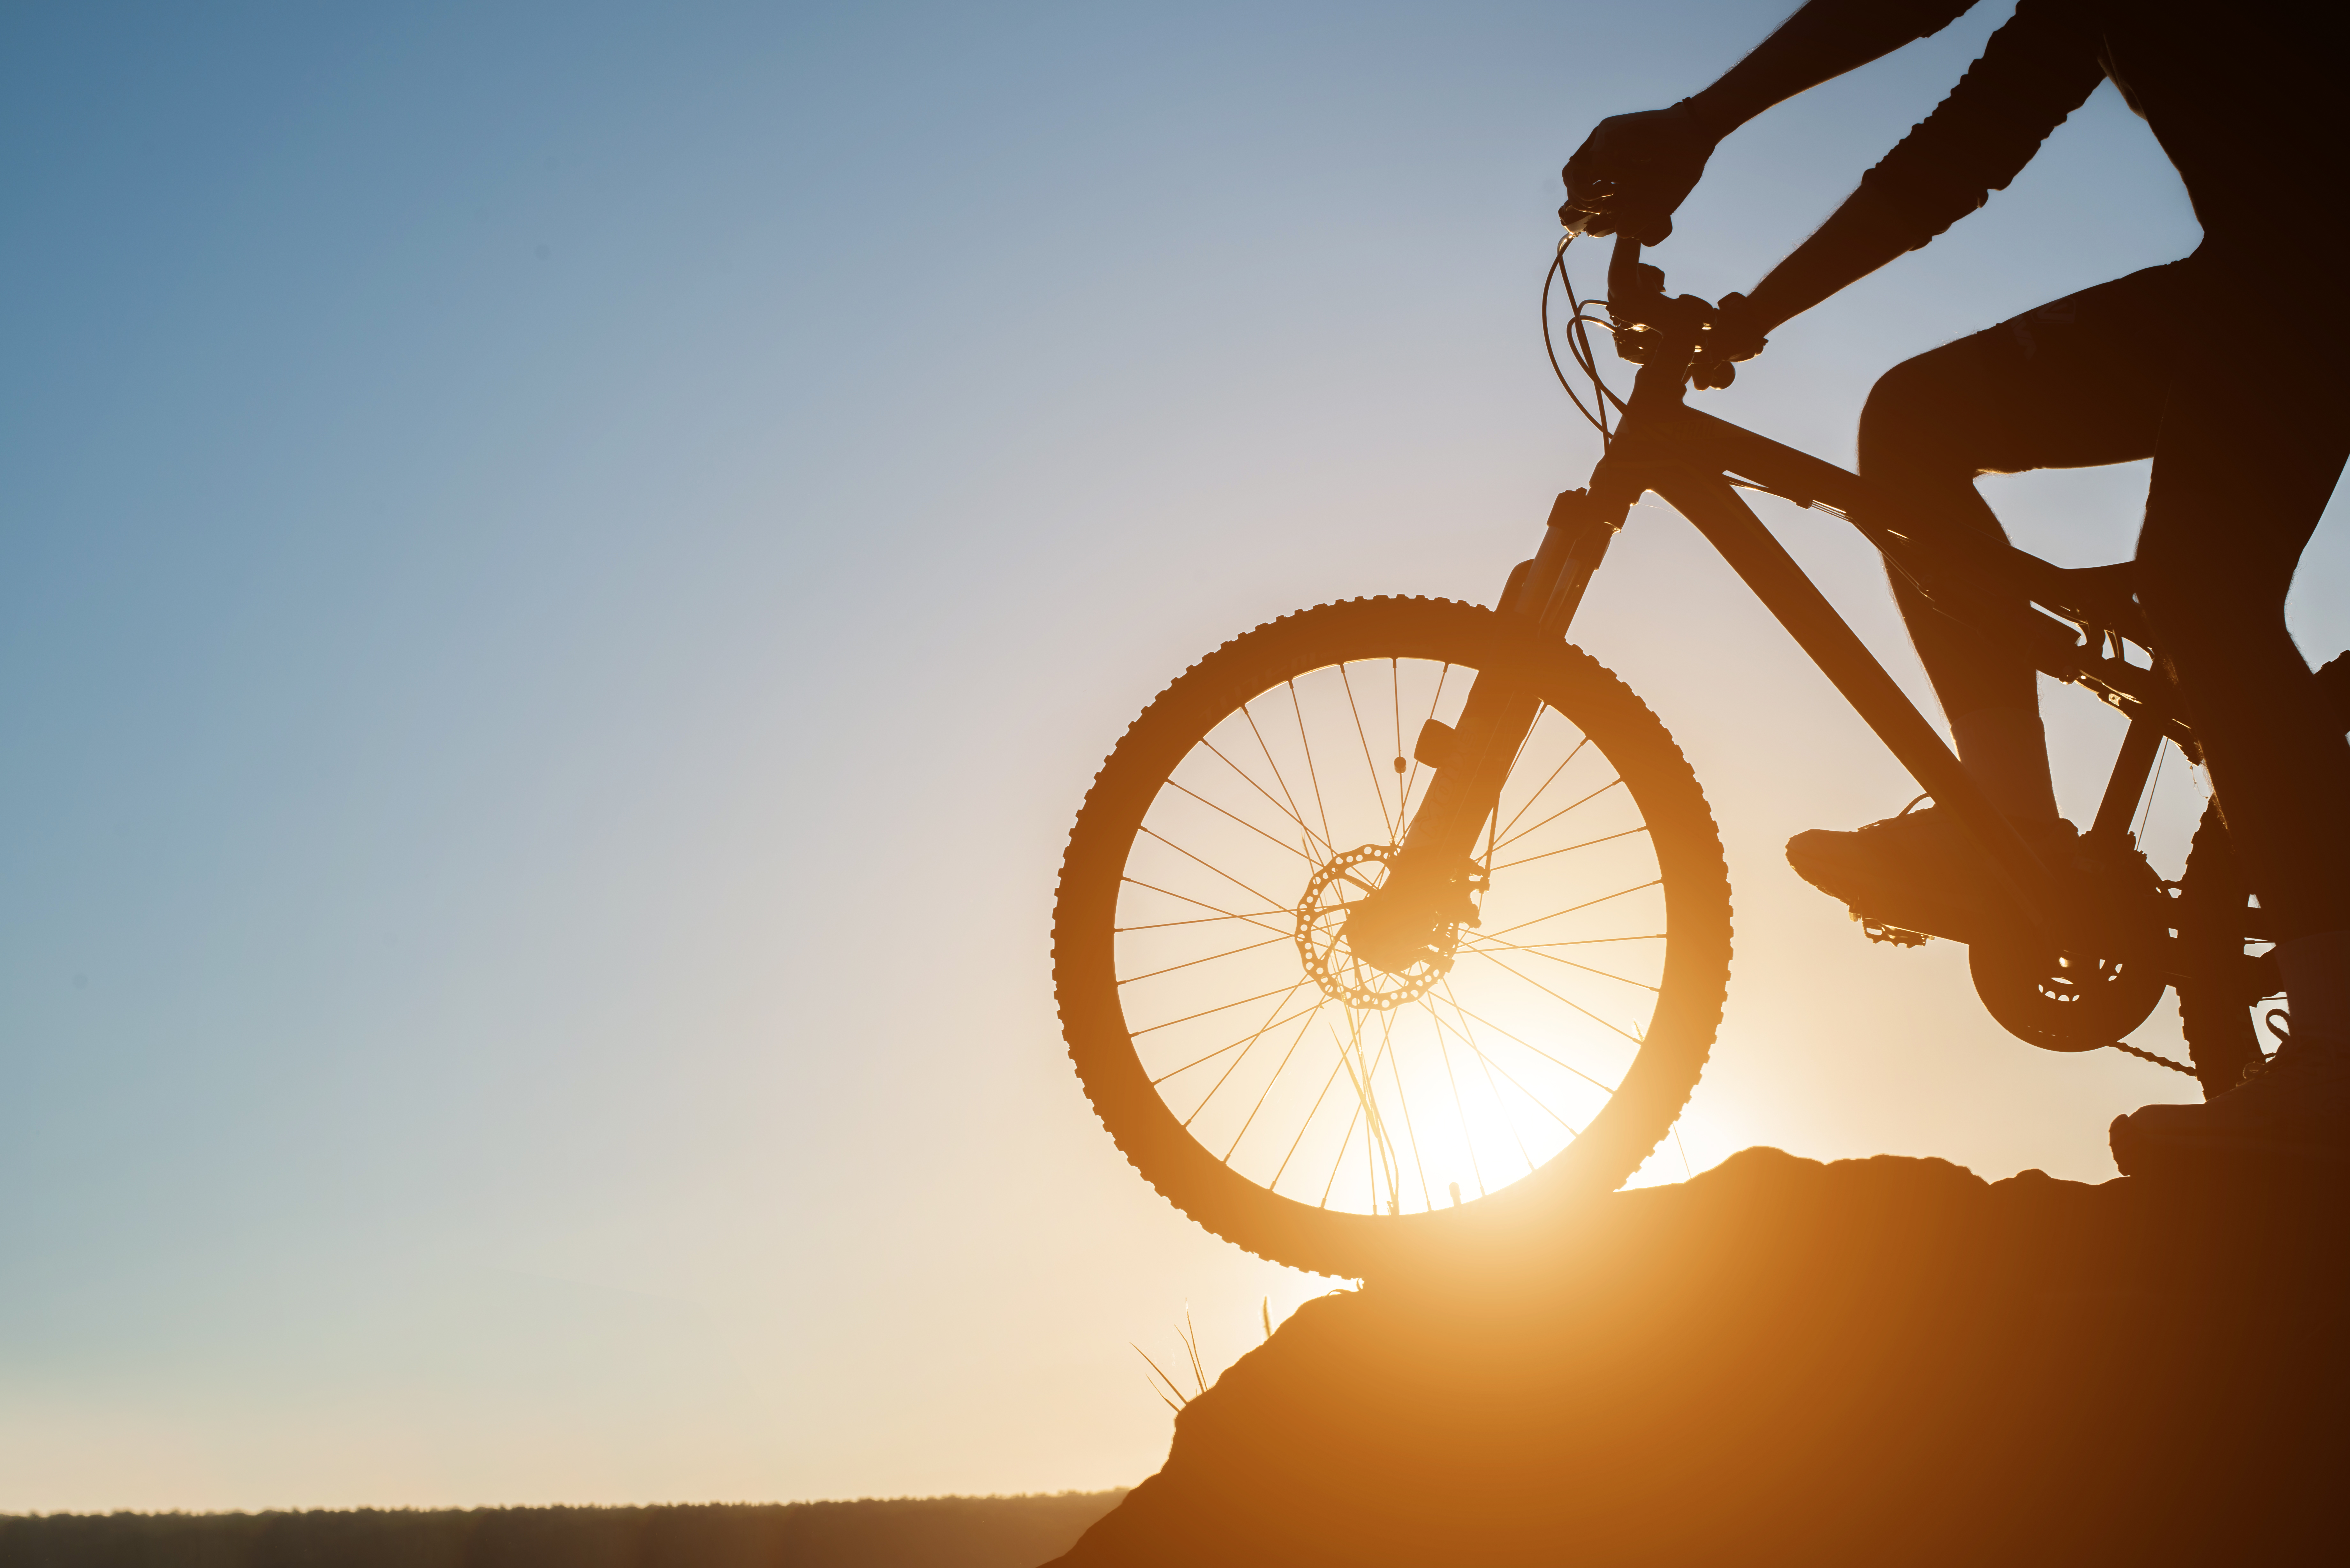 Ciclista se preparando para aventura de Mountain Bike